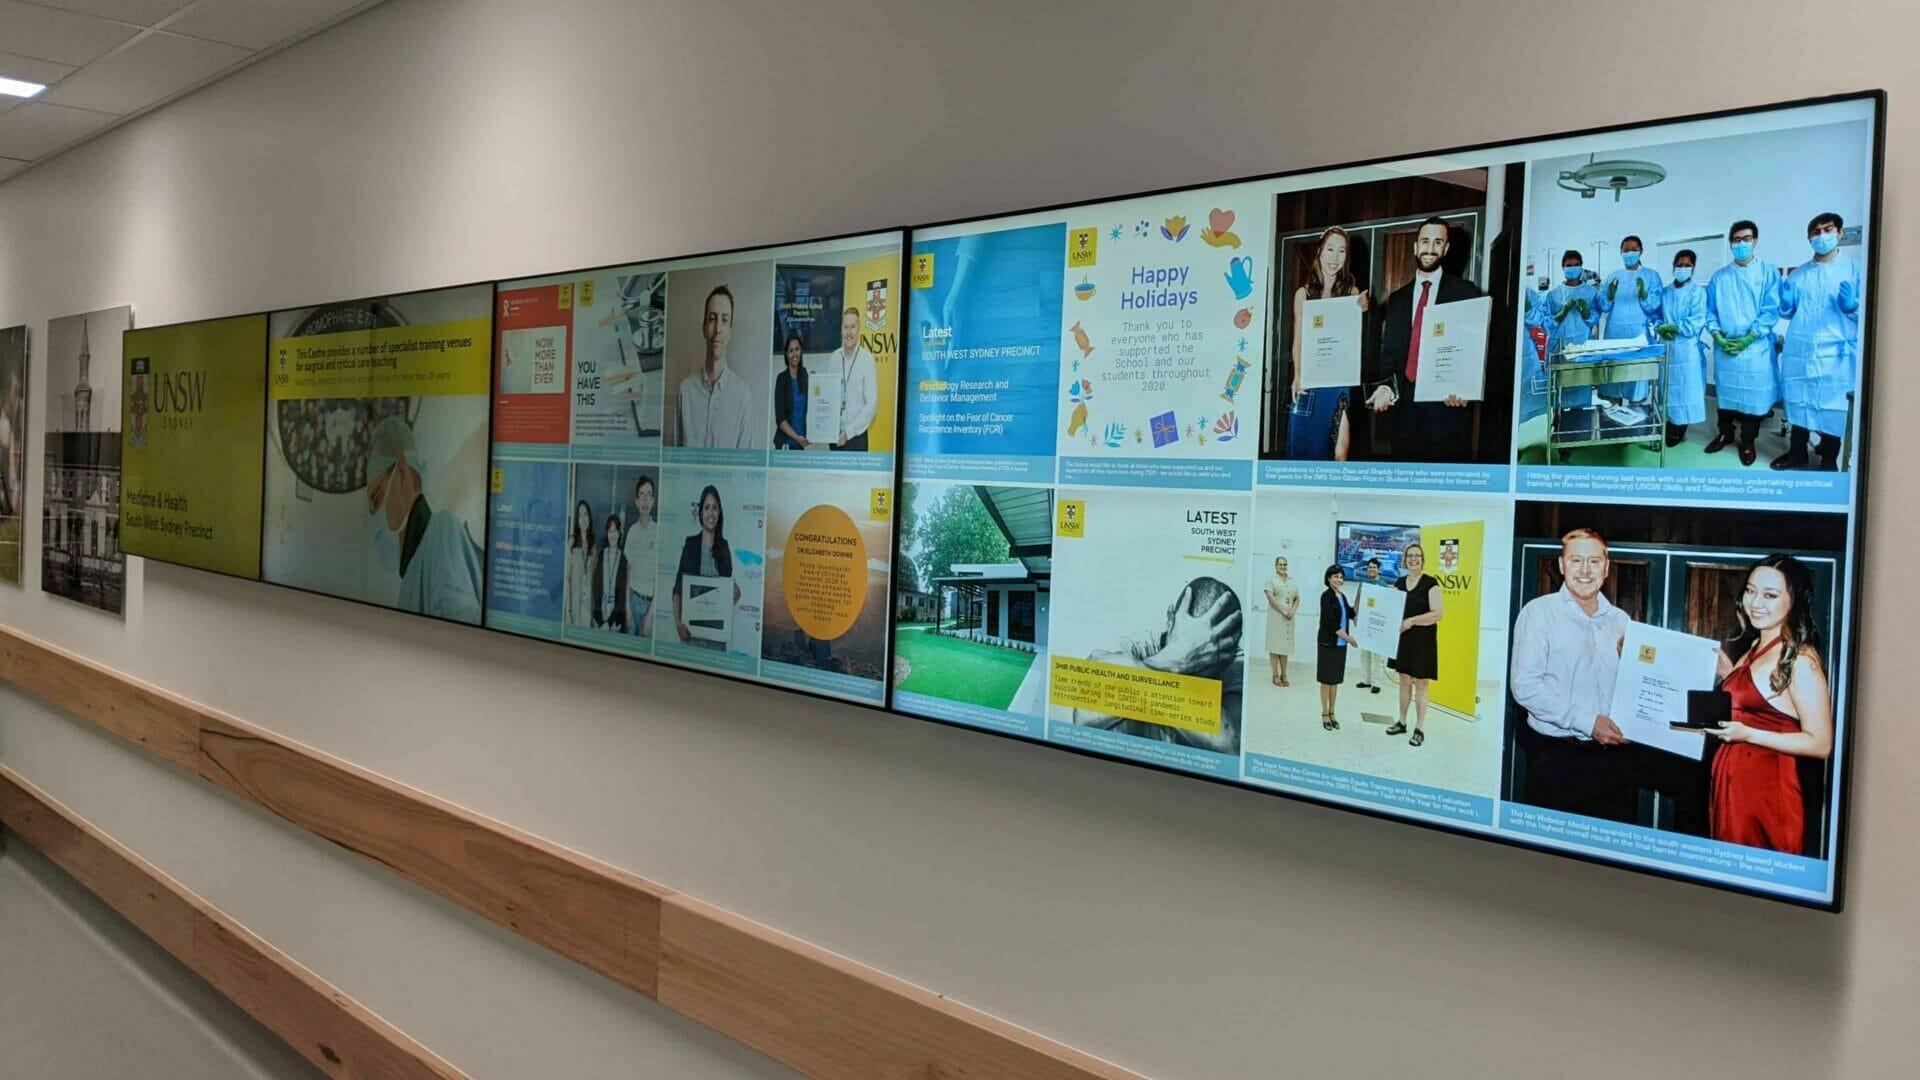 Video Wall & Social Wall – UNSW Medicine & Health South West Sydney Precinct 4×1 Video Wall